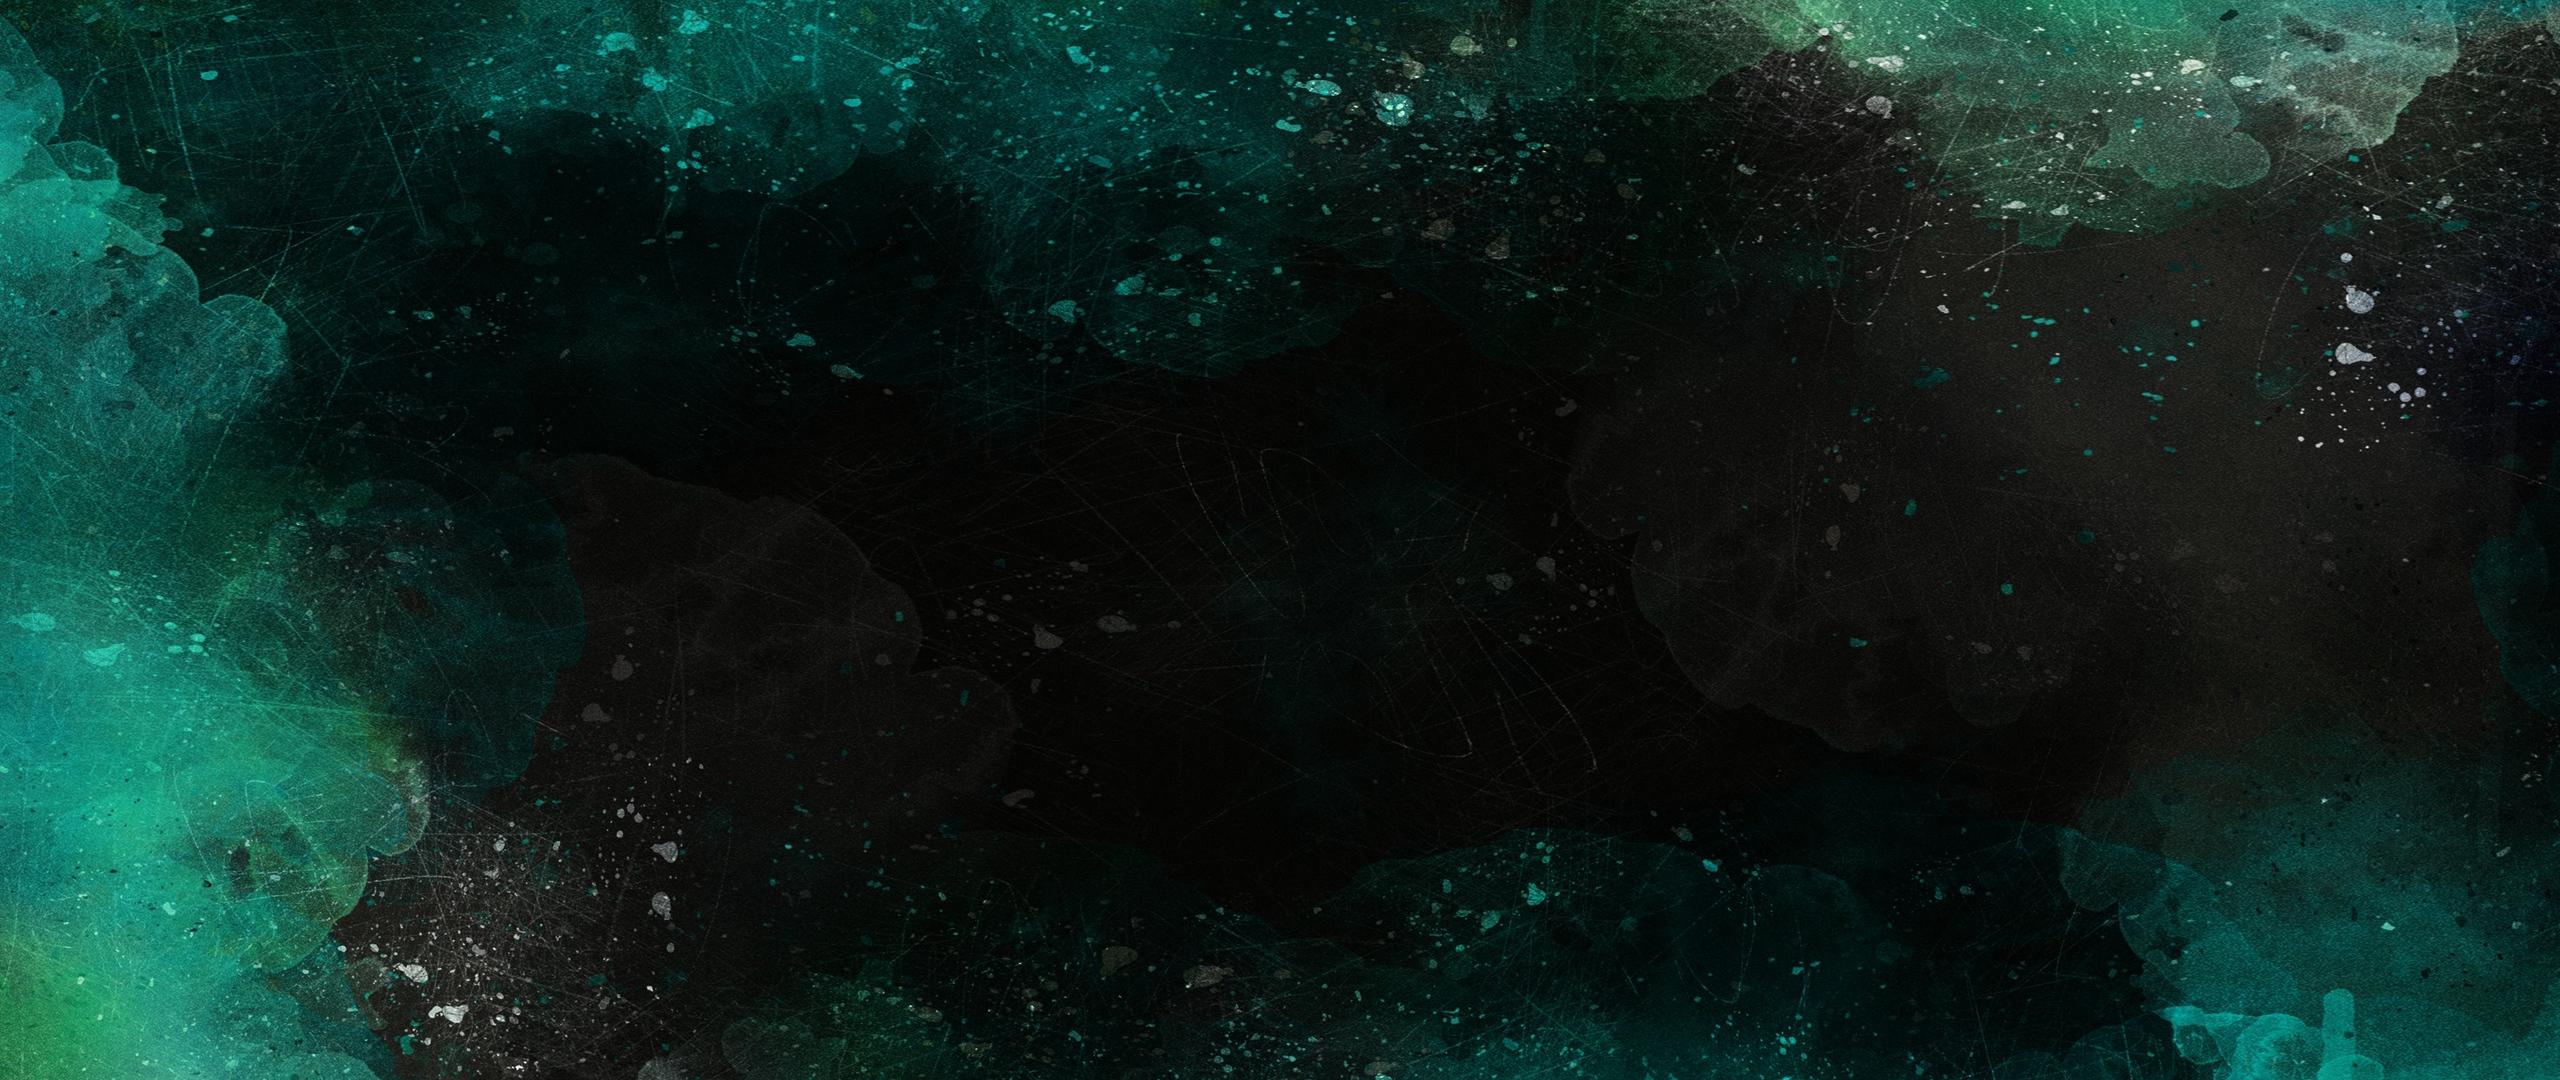 2560x1080 Download Wallpaper 2560x1080 Abstraction, Watercolor, Dark, Spots